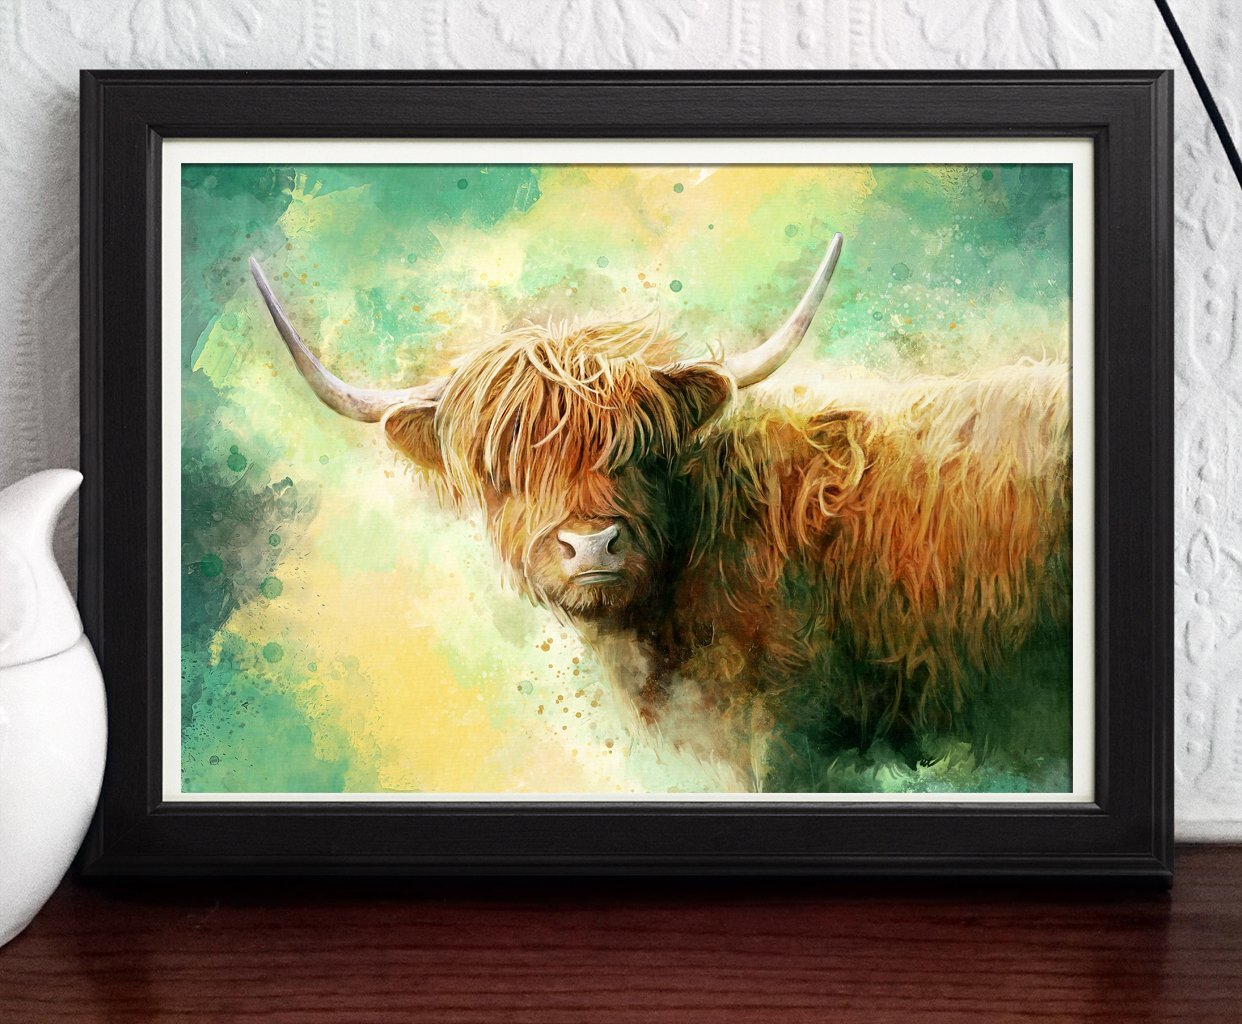 Amazon.com: Highland Cow Print - Art Painting - Scottish Cow ...